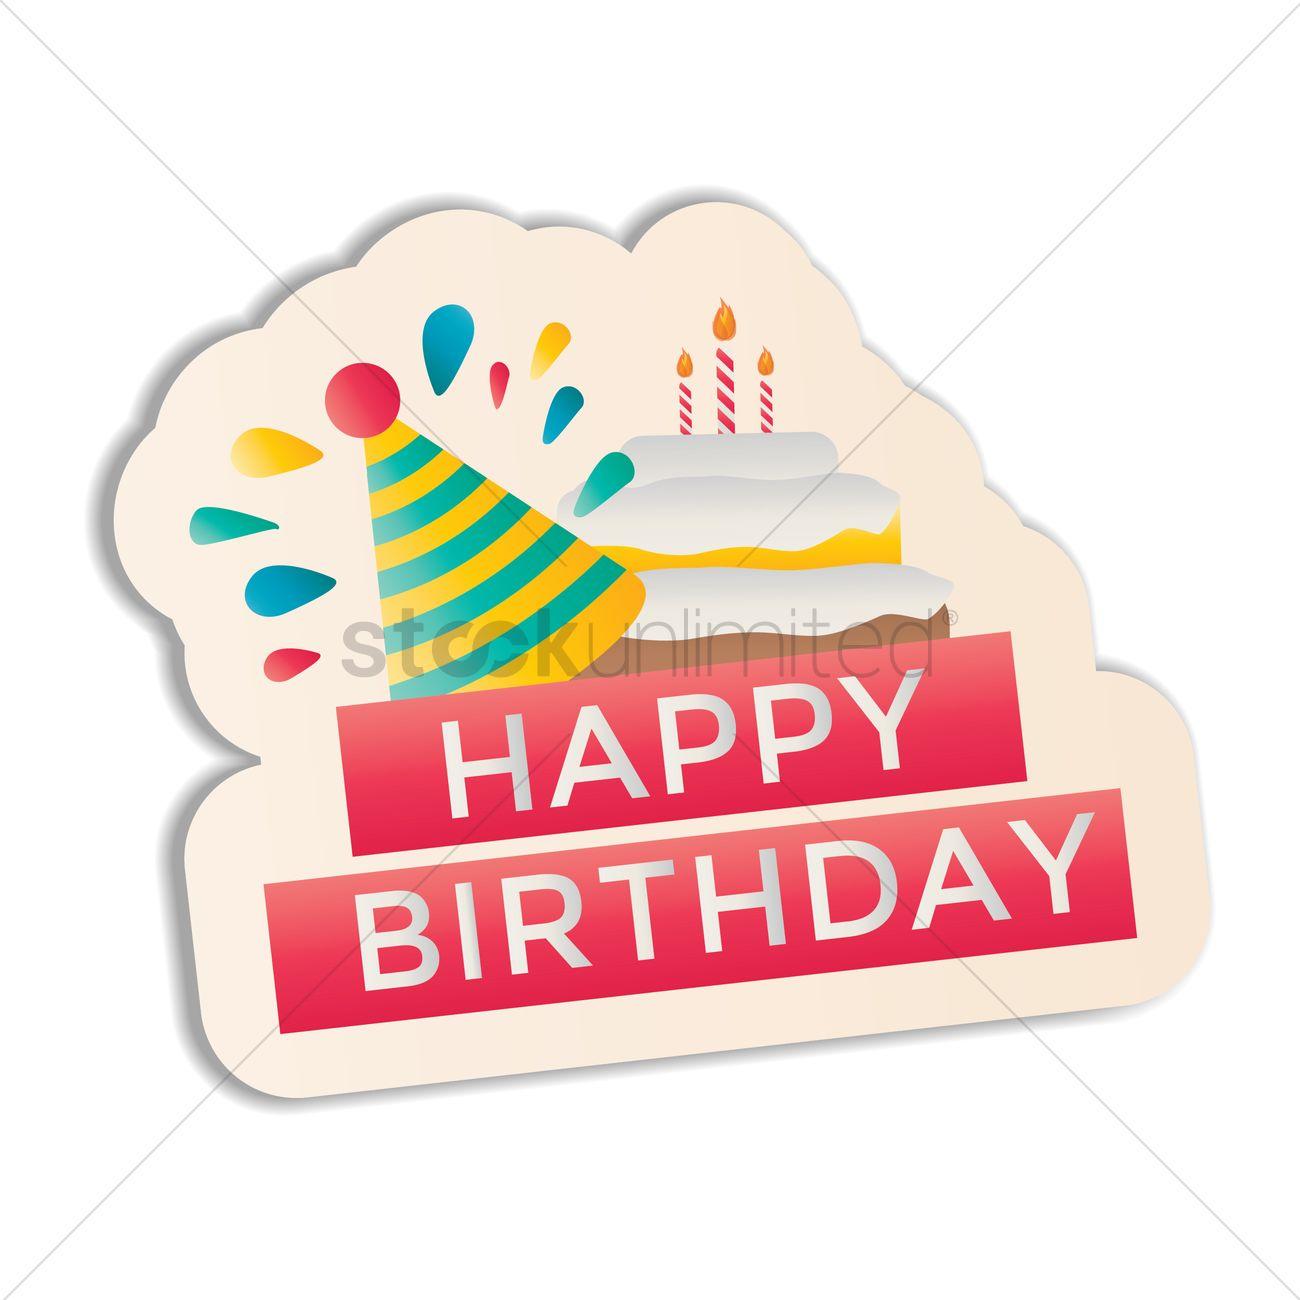 Happy birthday sticker vector graphic